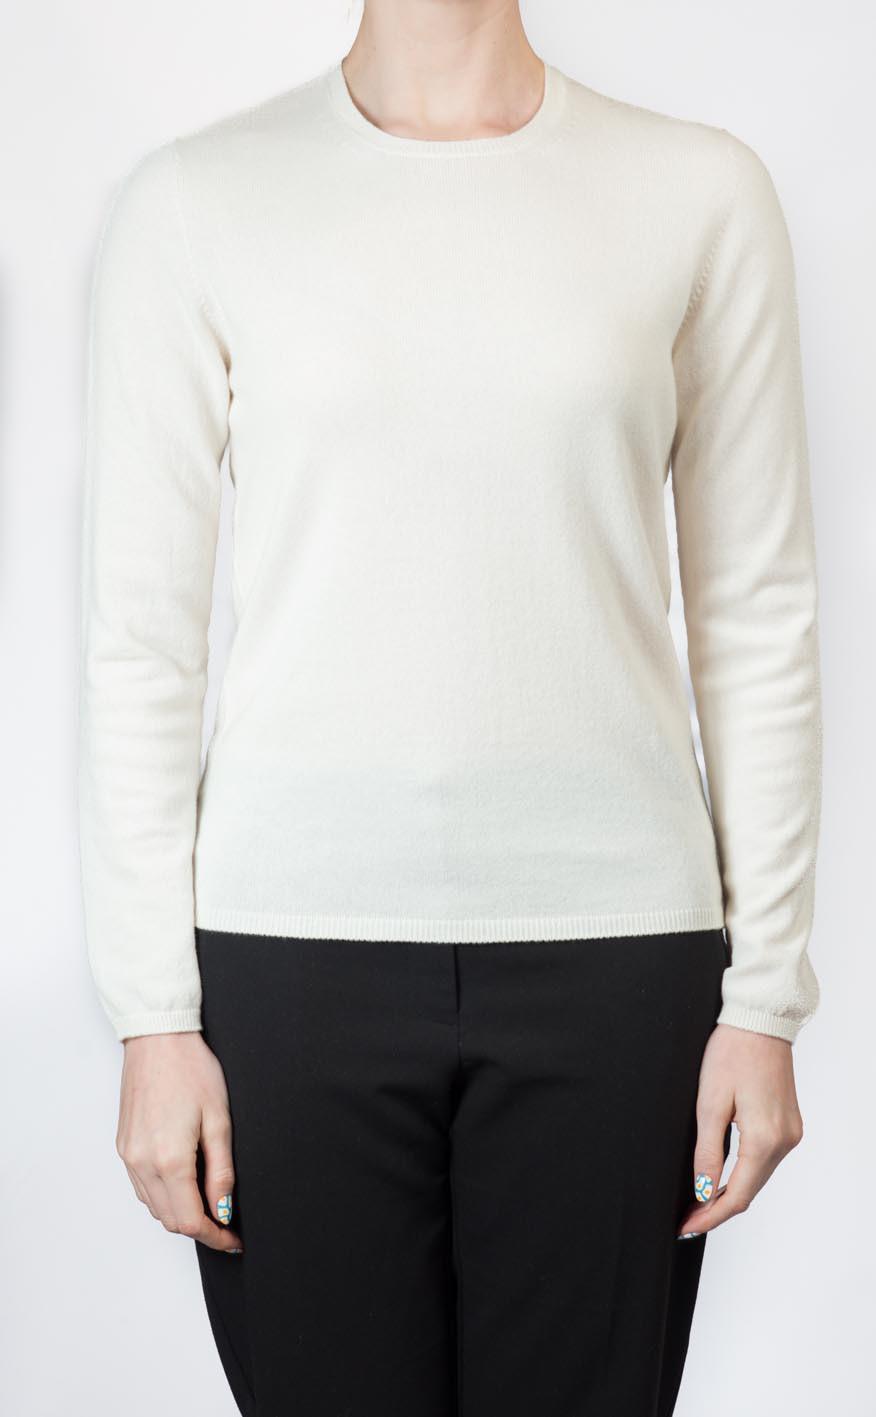 Cashmere Crew Neck Sweater | CLAN by Scotweb